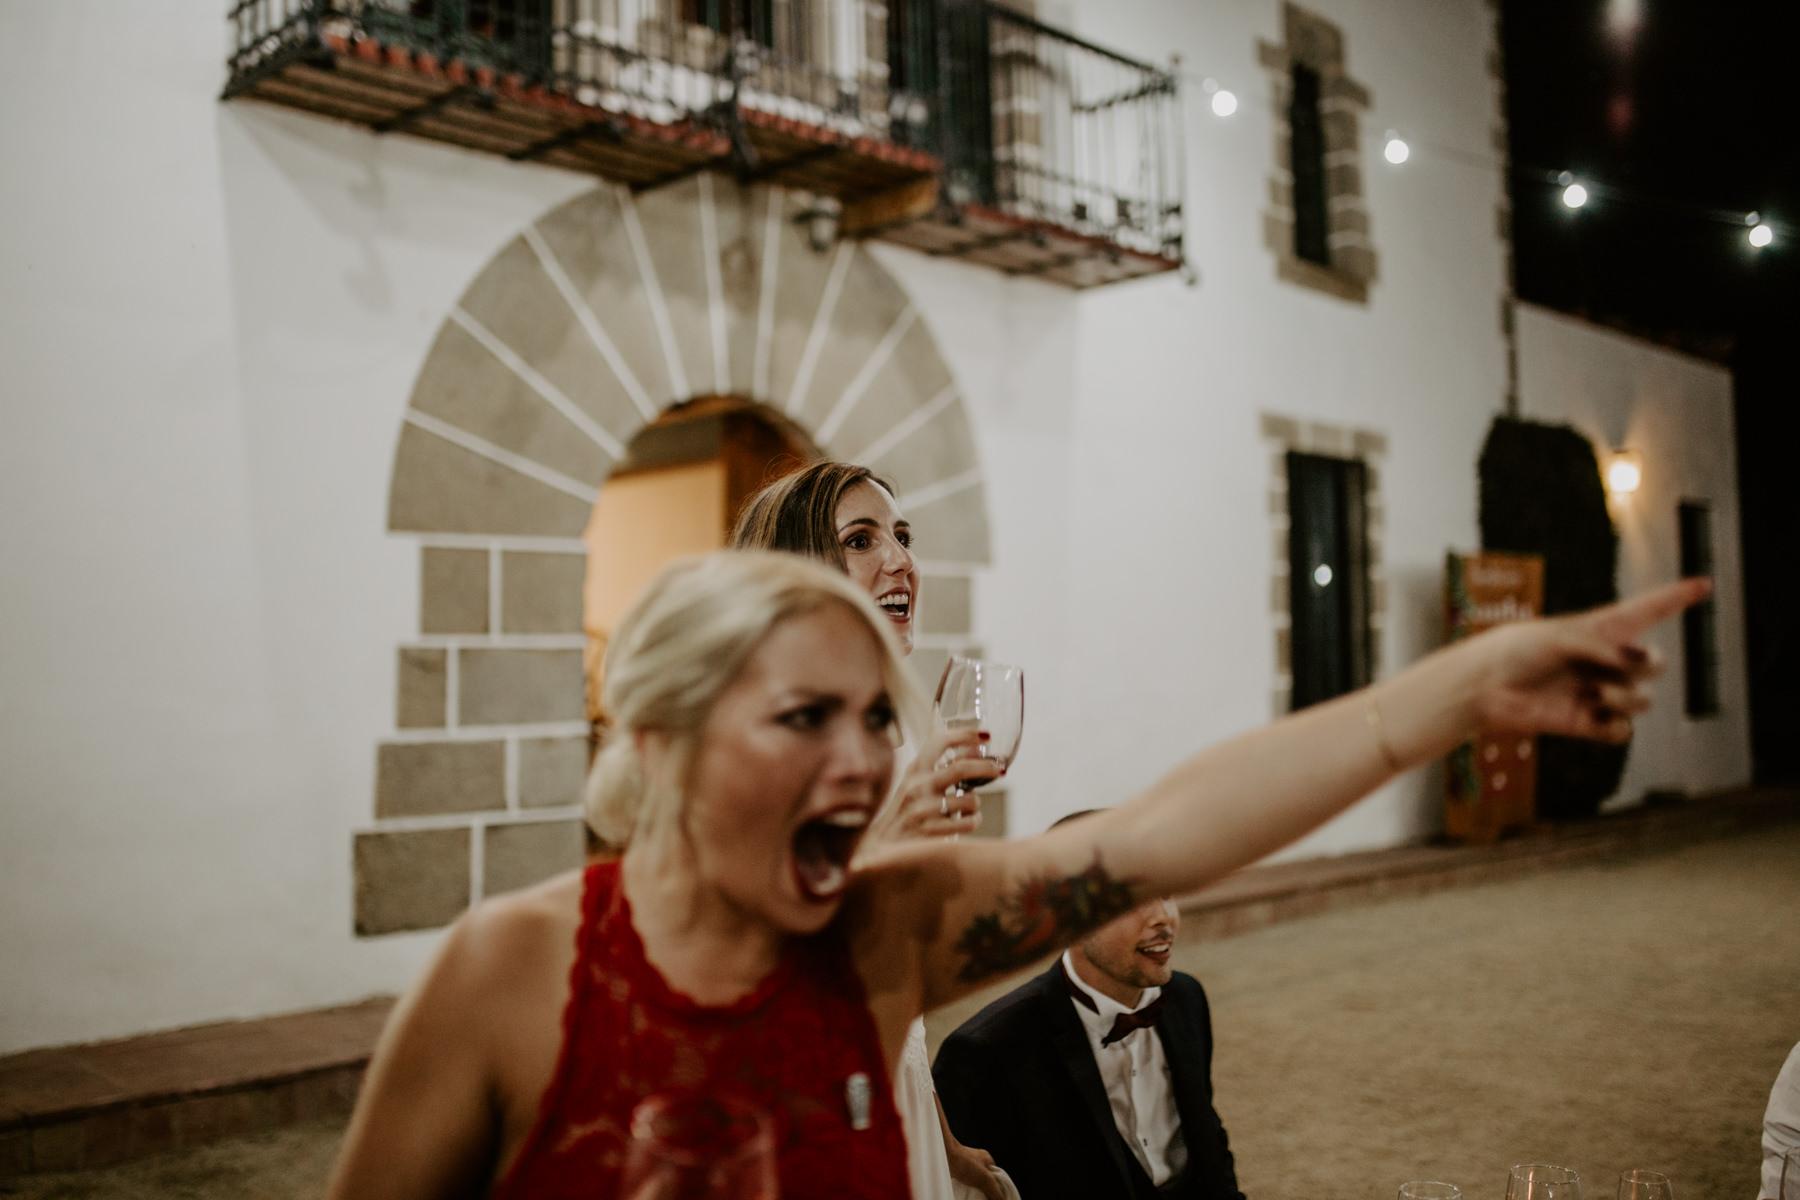 alt_thenortherngirlphotography_couples_weddingphotographer_photographer_wedding_boda_fotografodebodas_fotografobodasbarcelona_bodaindie_bodasconestilo_bodaensantperedeclara_jennifermiguel-797.jpg